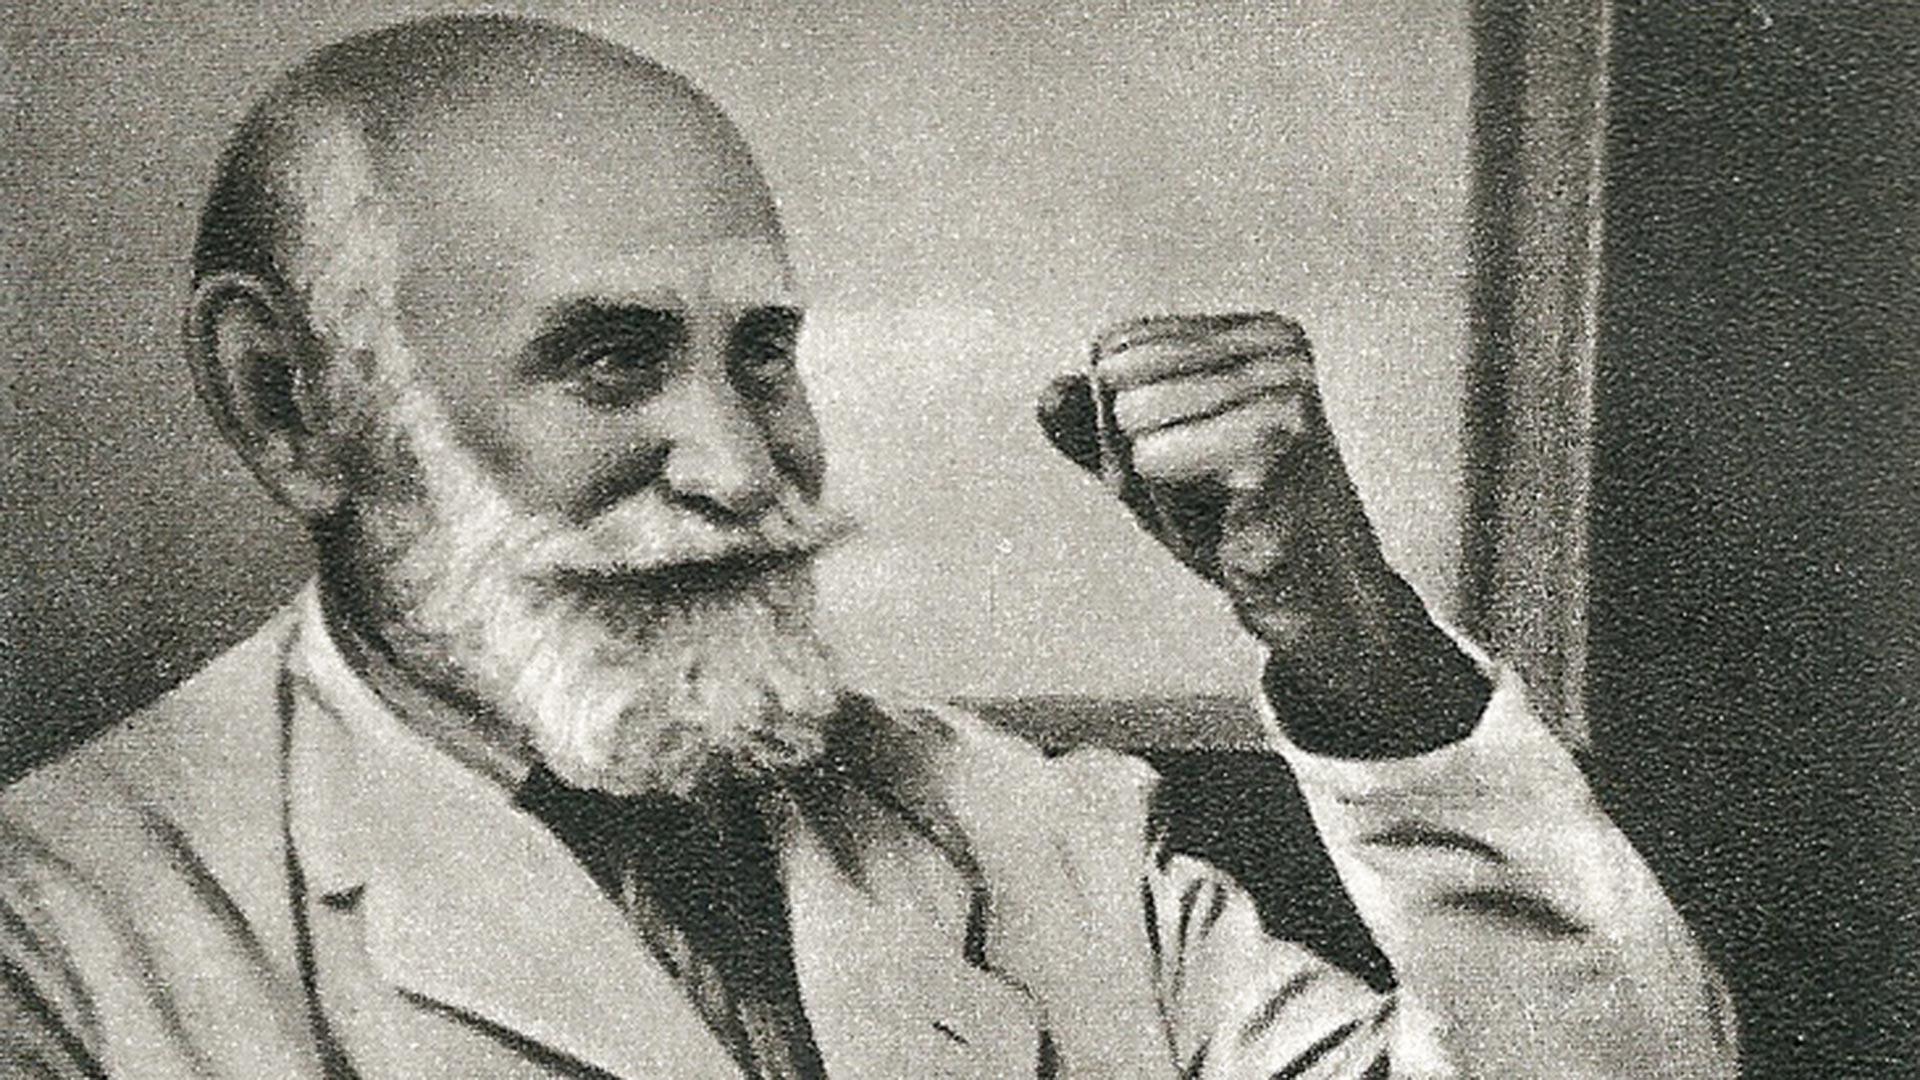 Akademik I. P. Pavlov